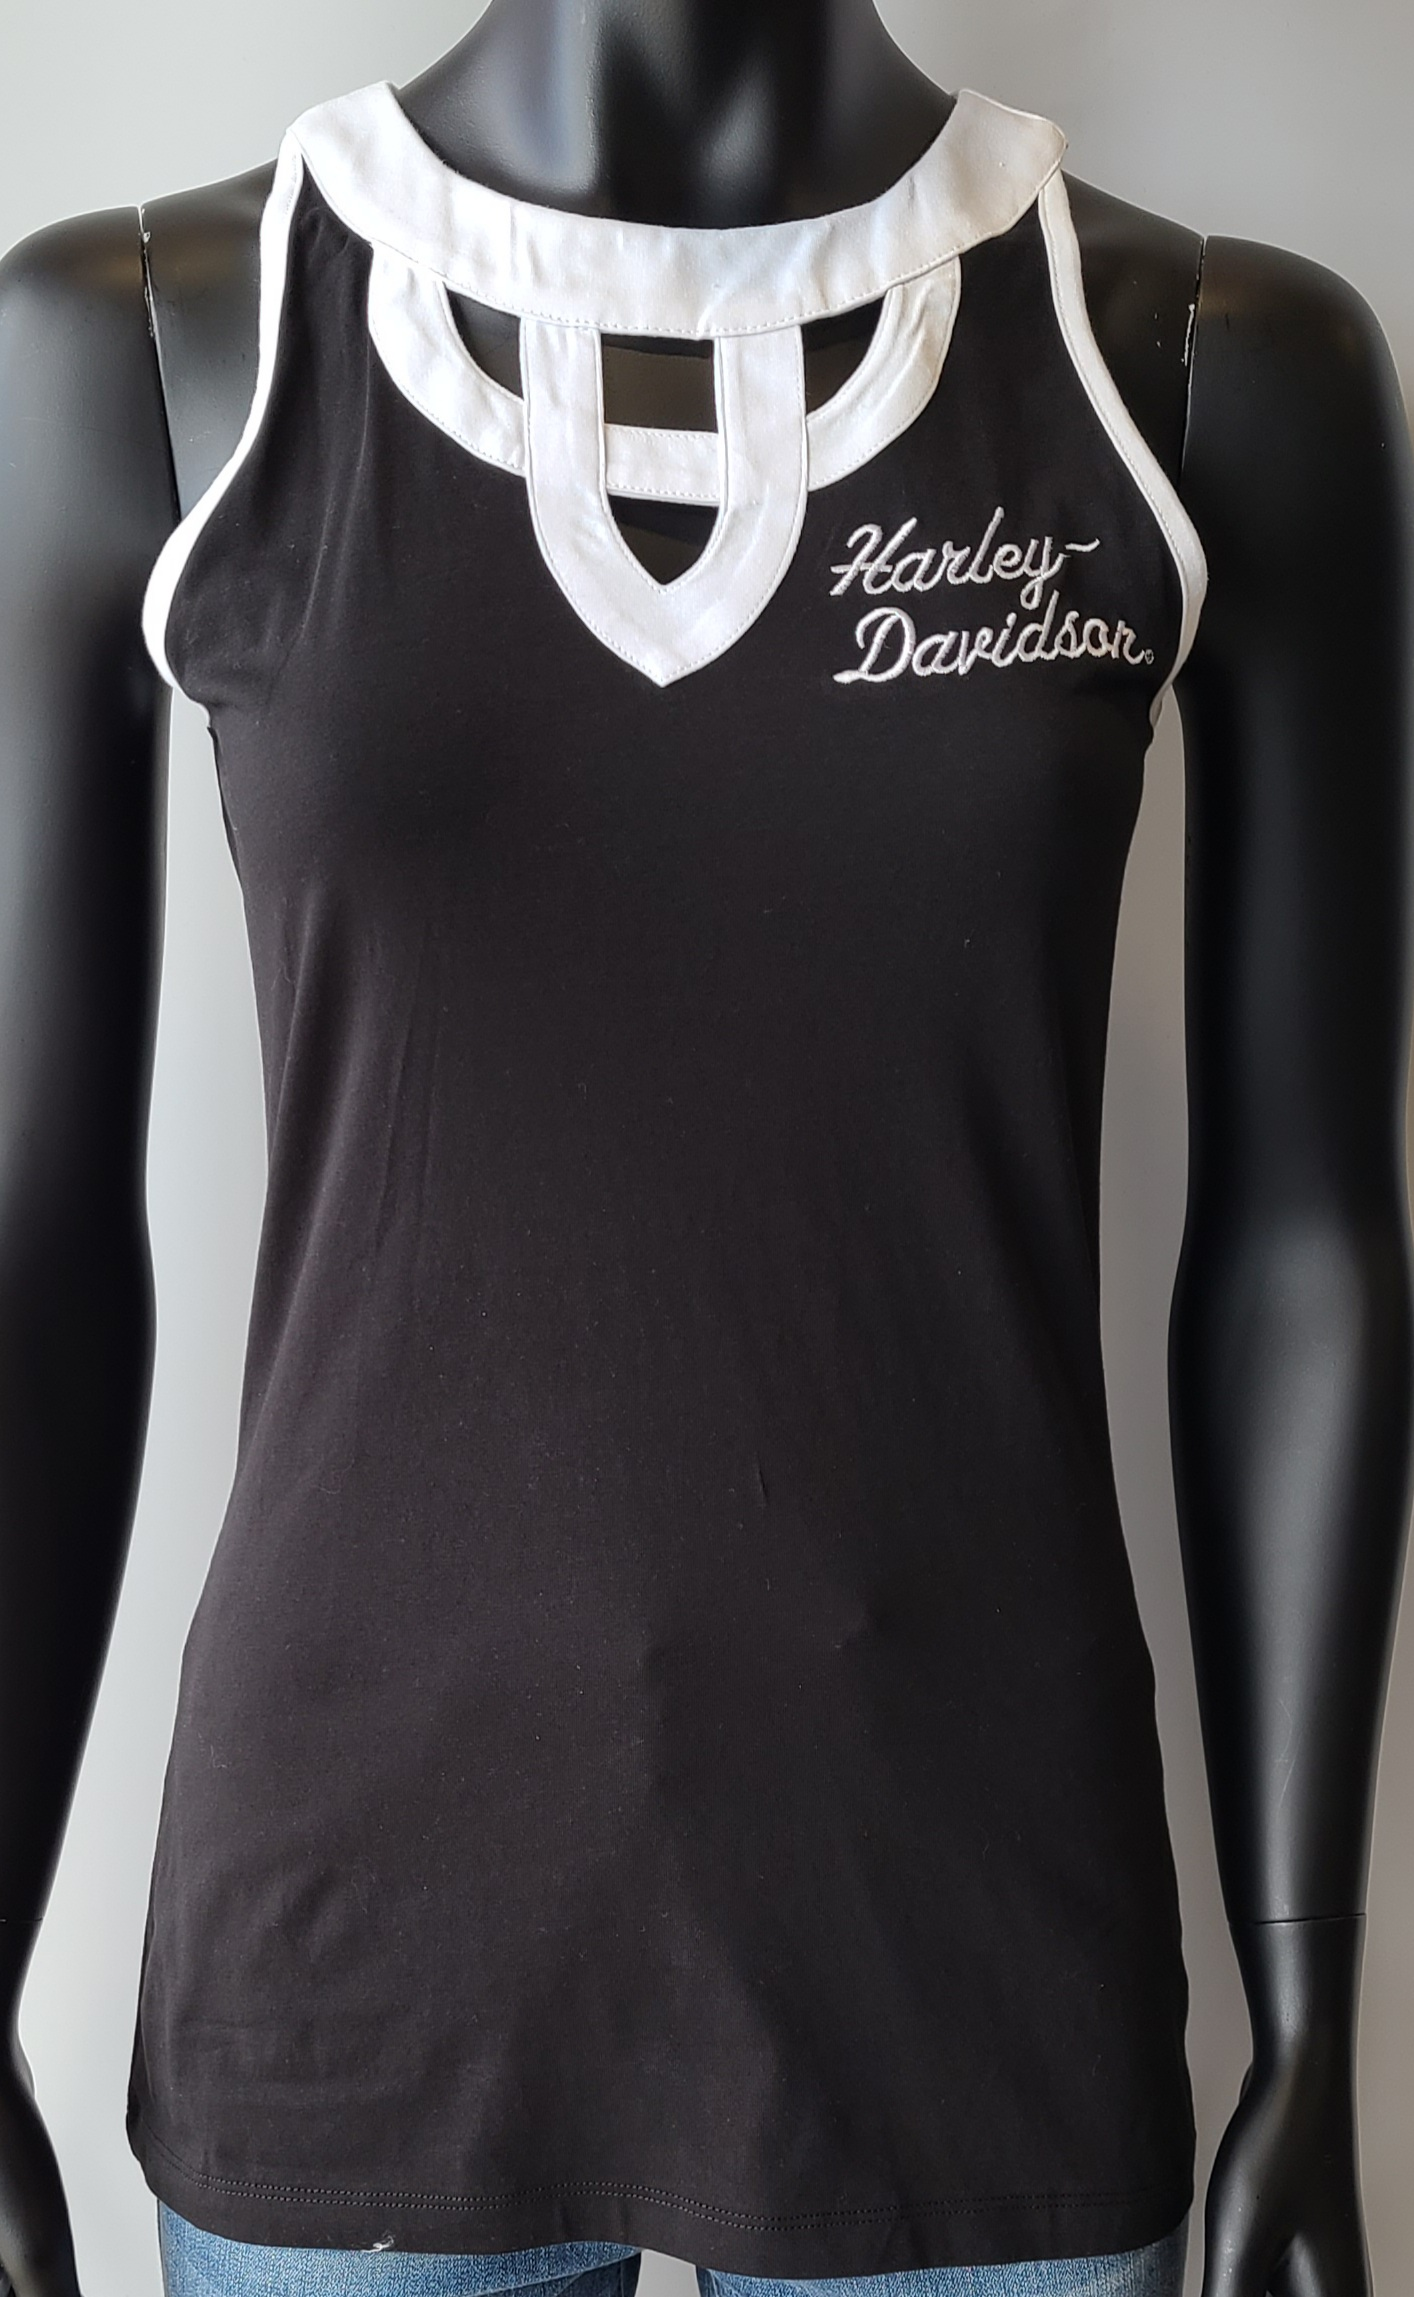 HARLEY DAVIDSON BLACK/WHITE*HANDS N HEARTS